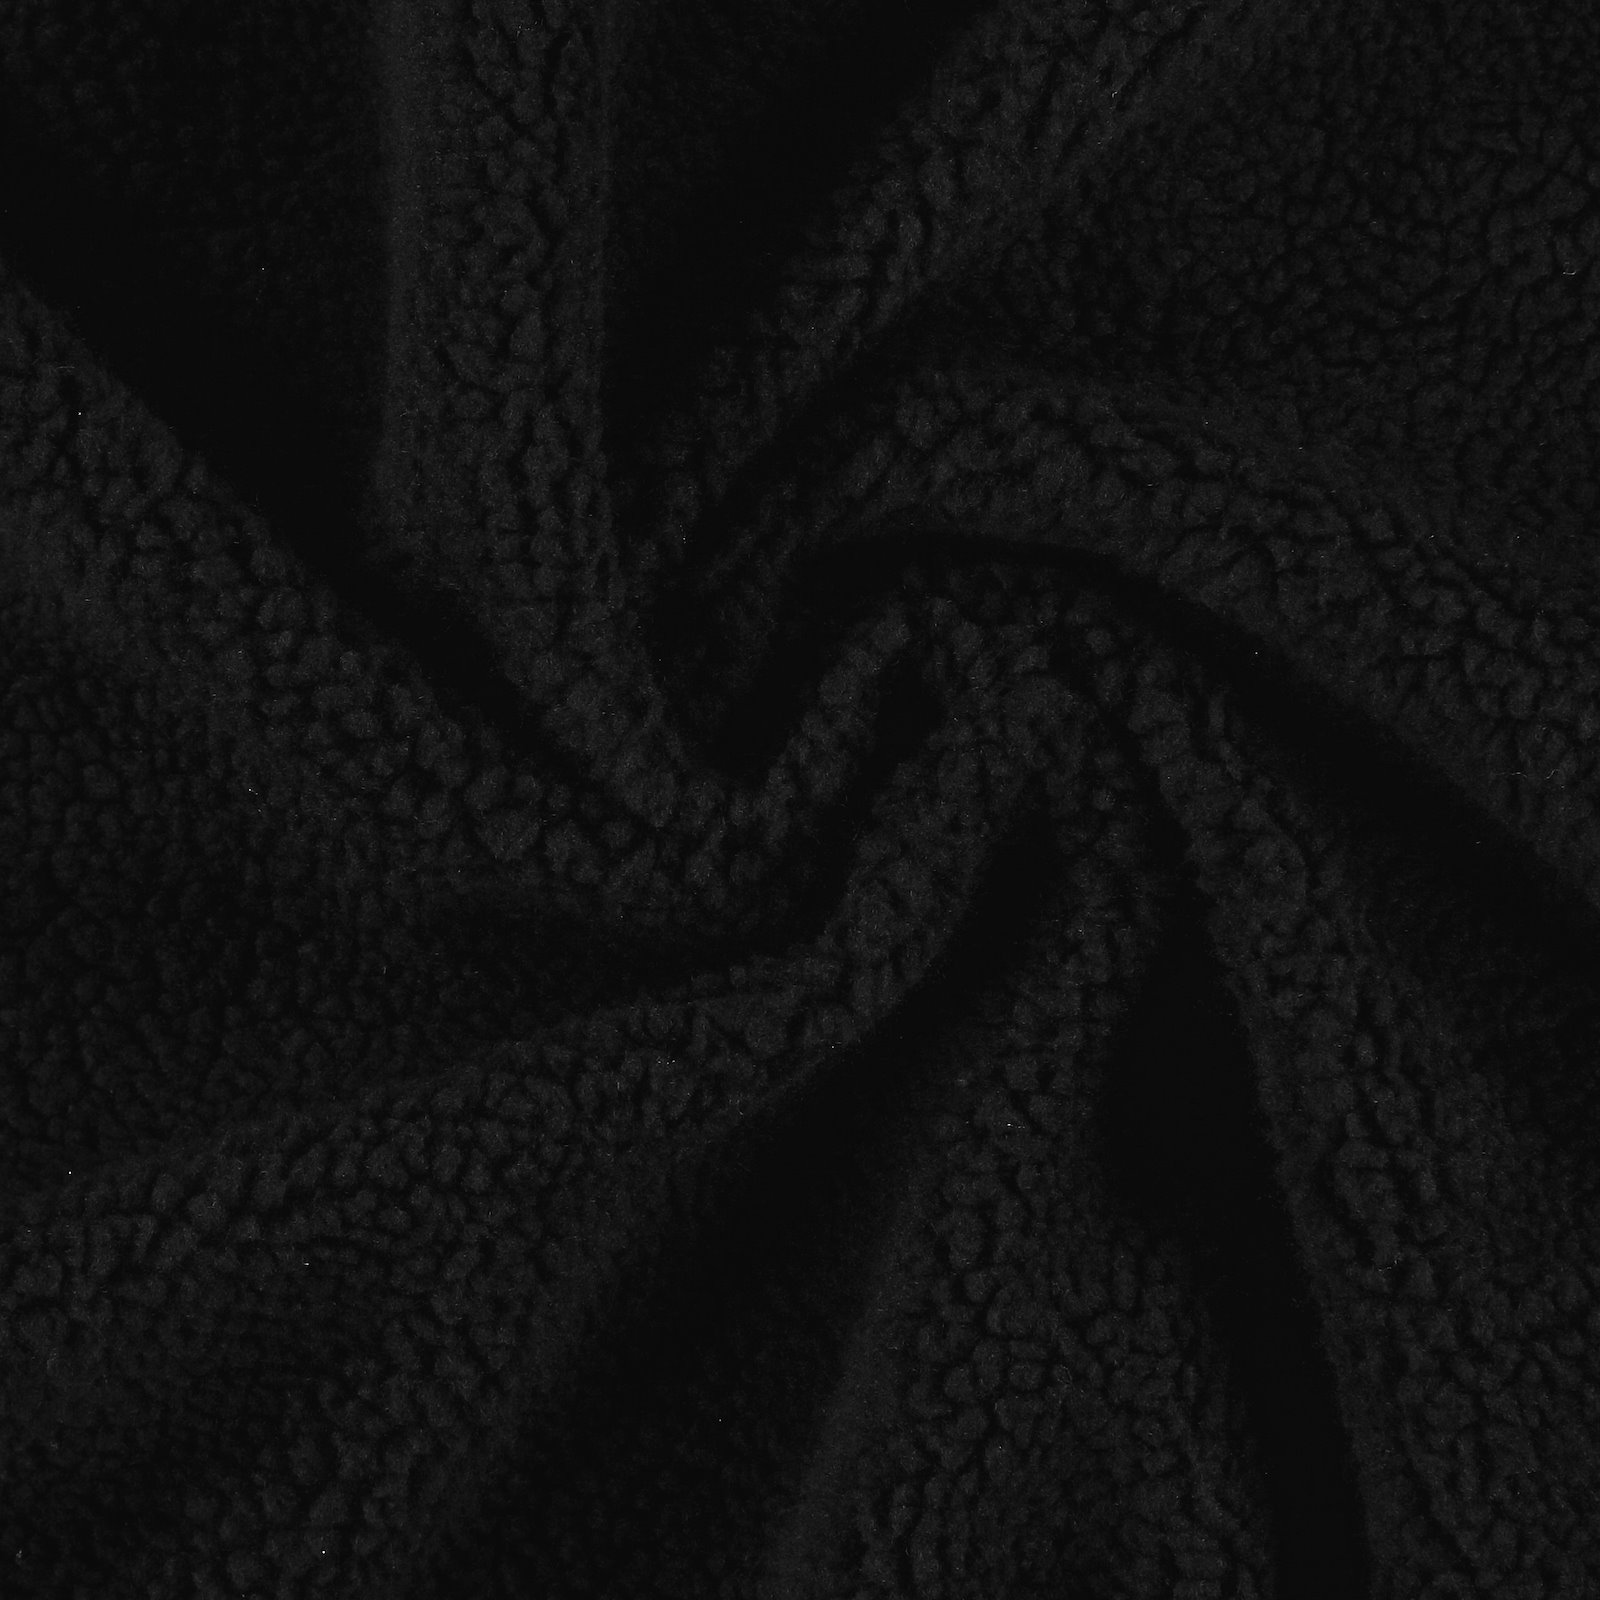 Teddy bear black 910293_pack